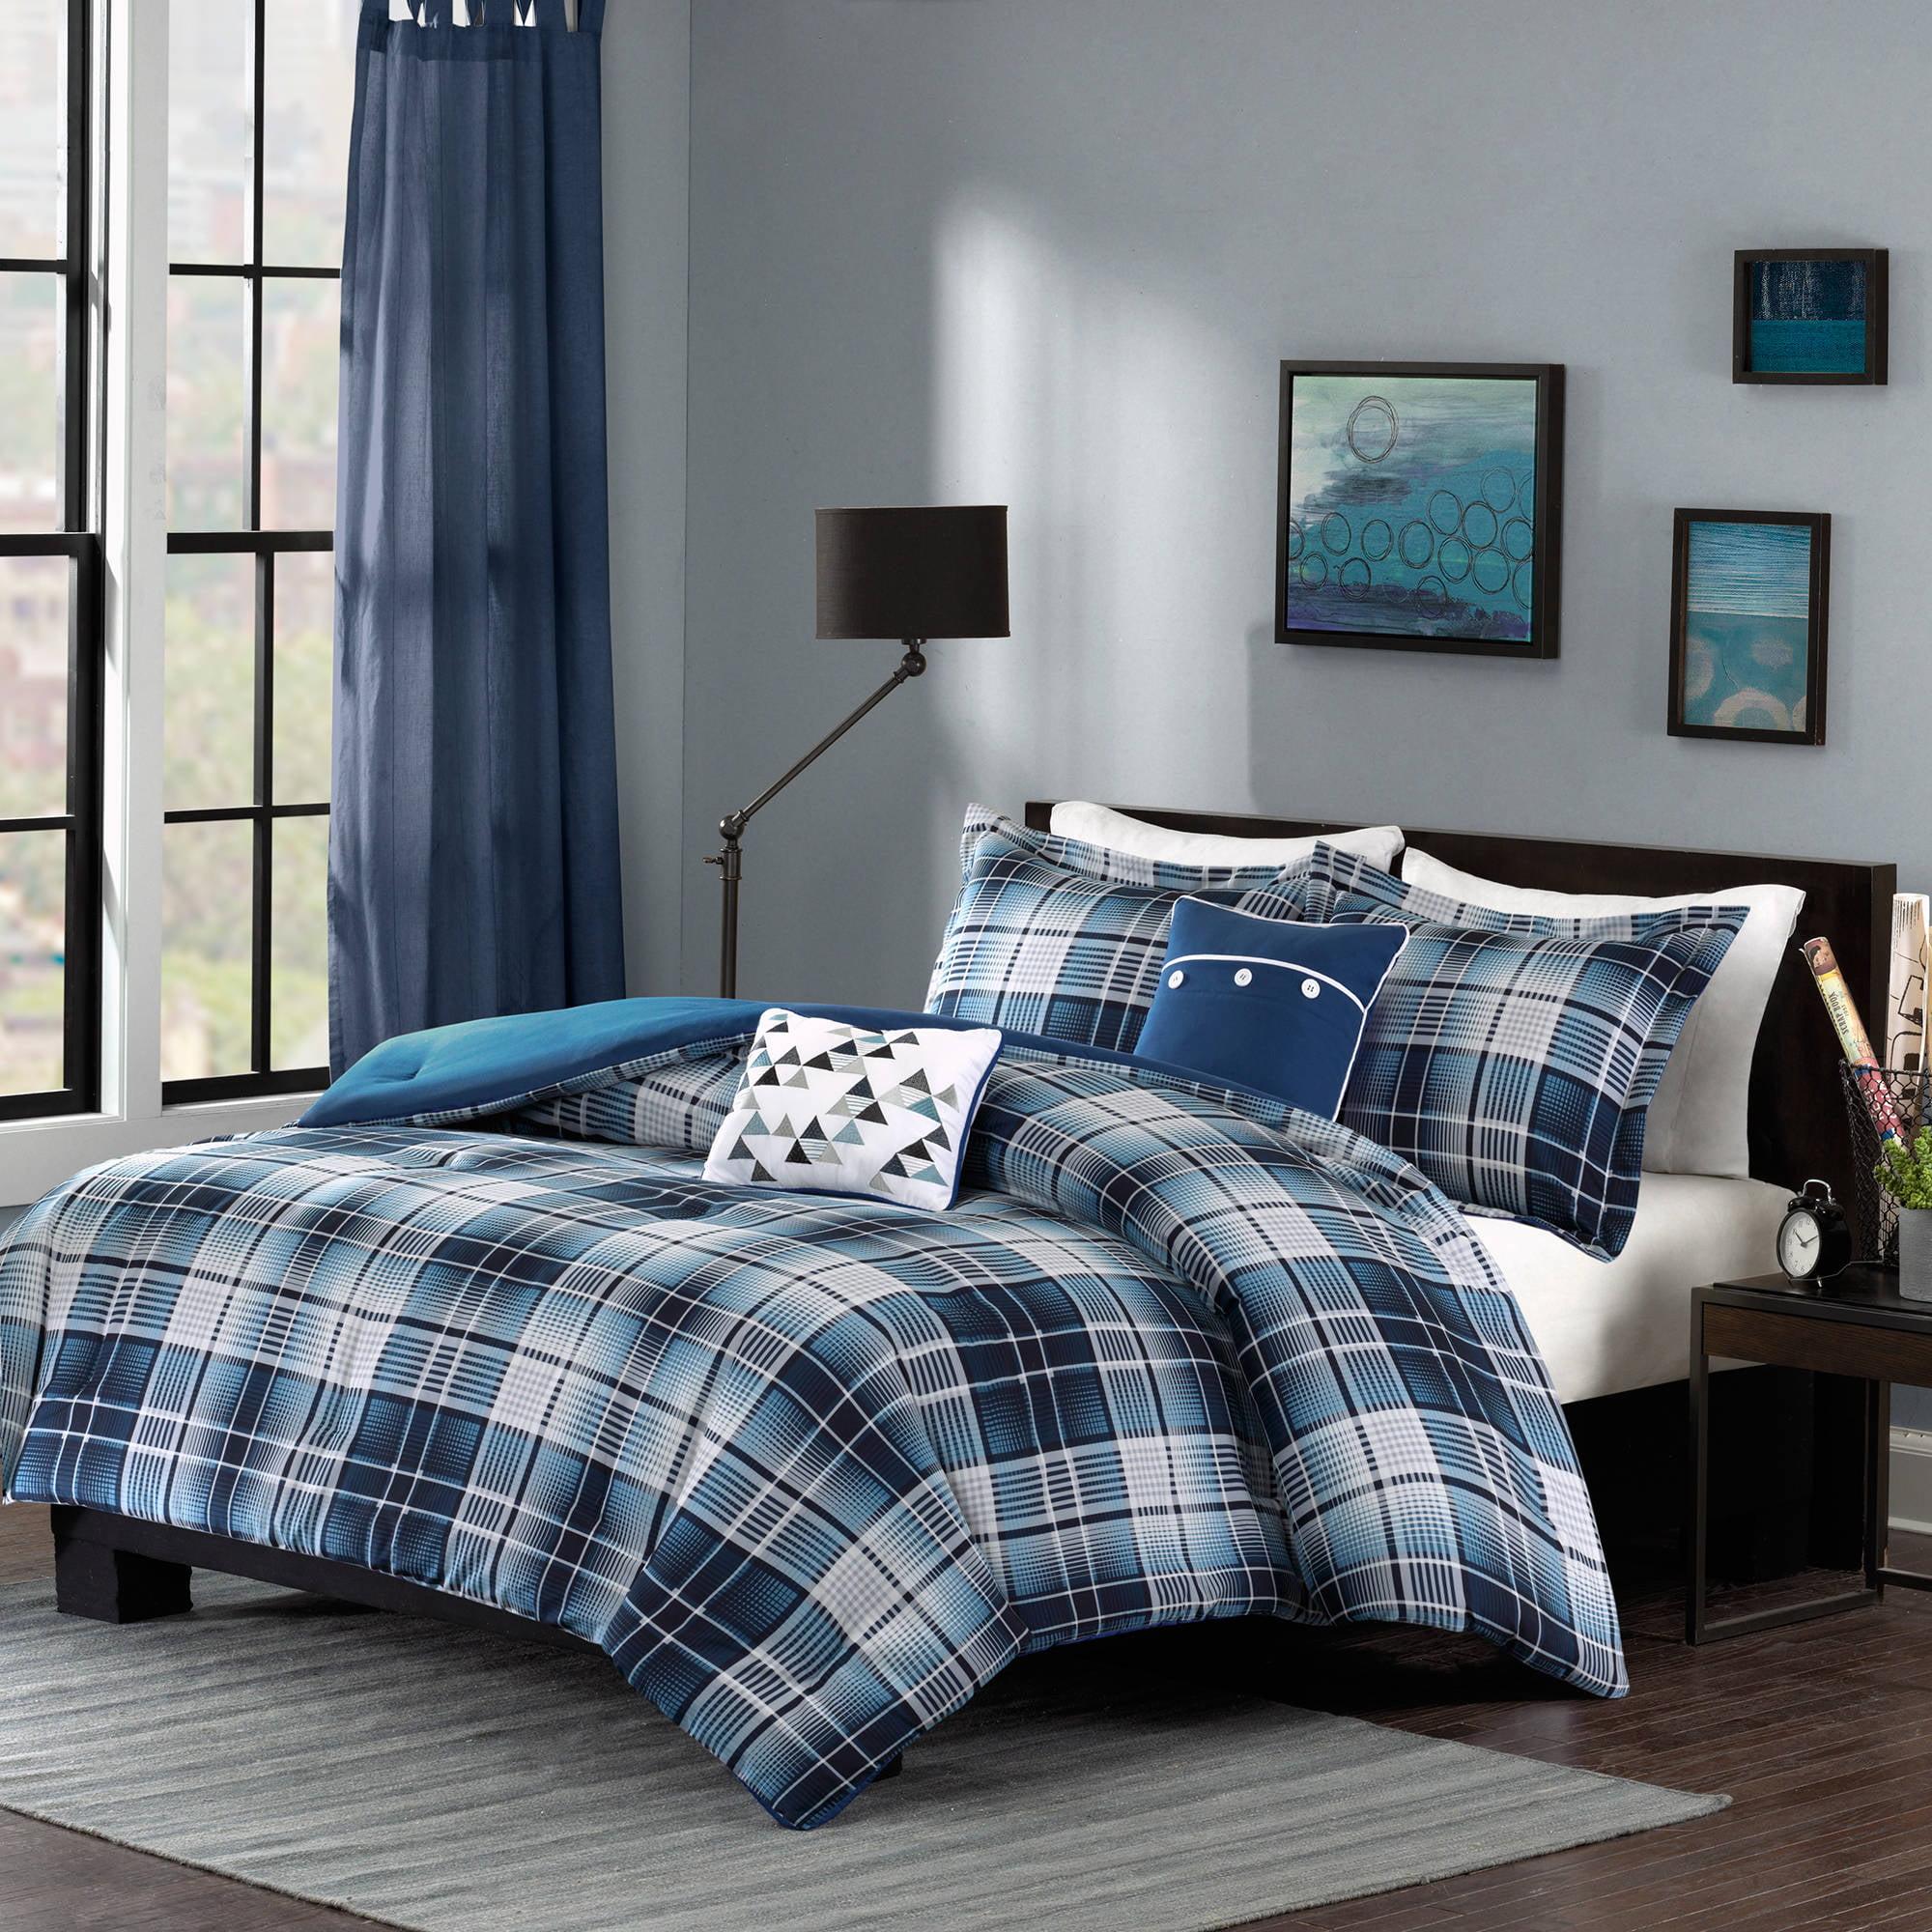 Home Essence Apartment Dane Plaid Comforter Bedding Set